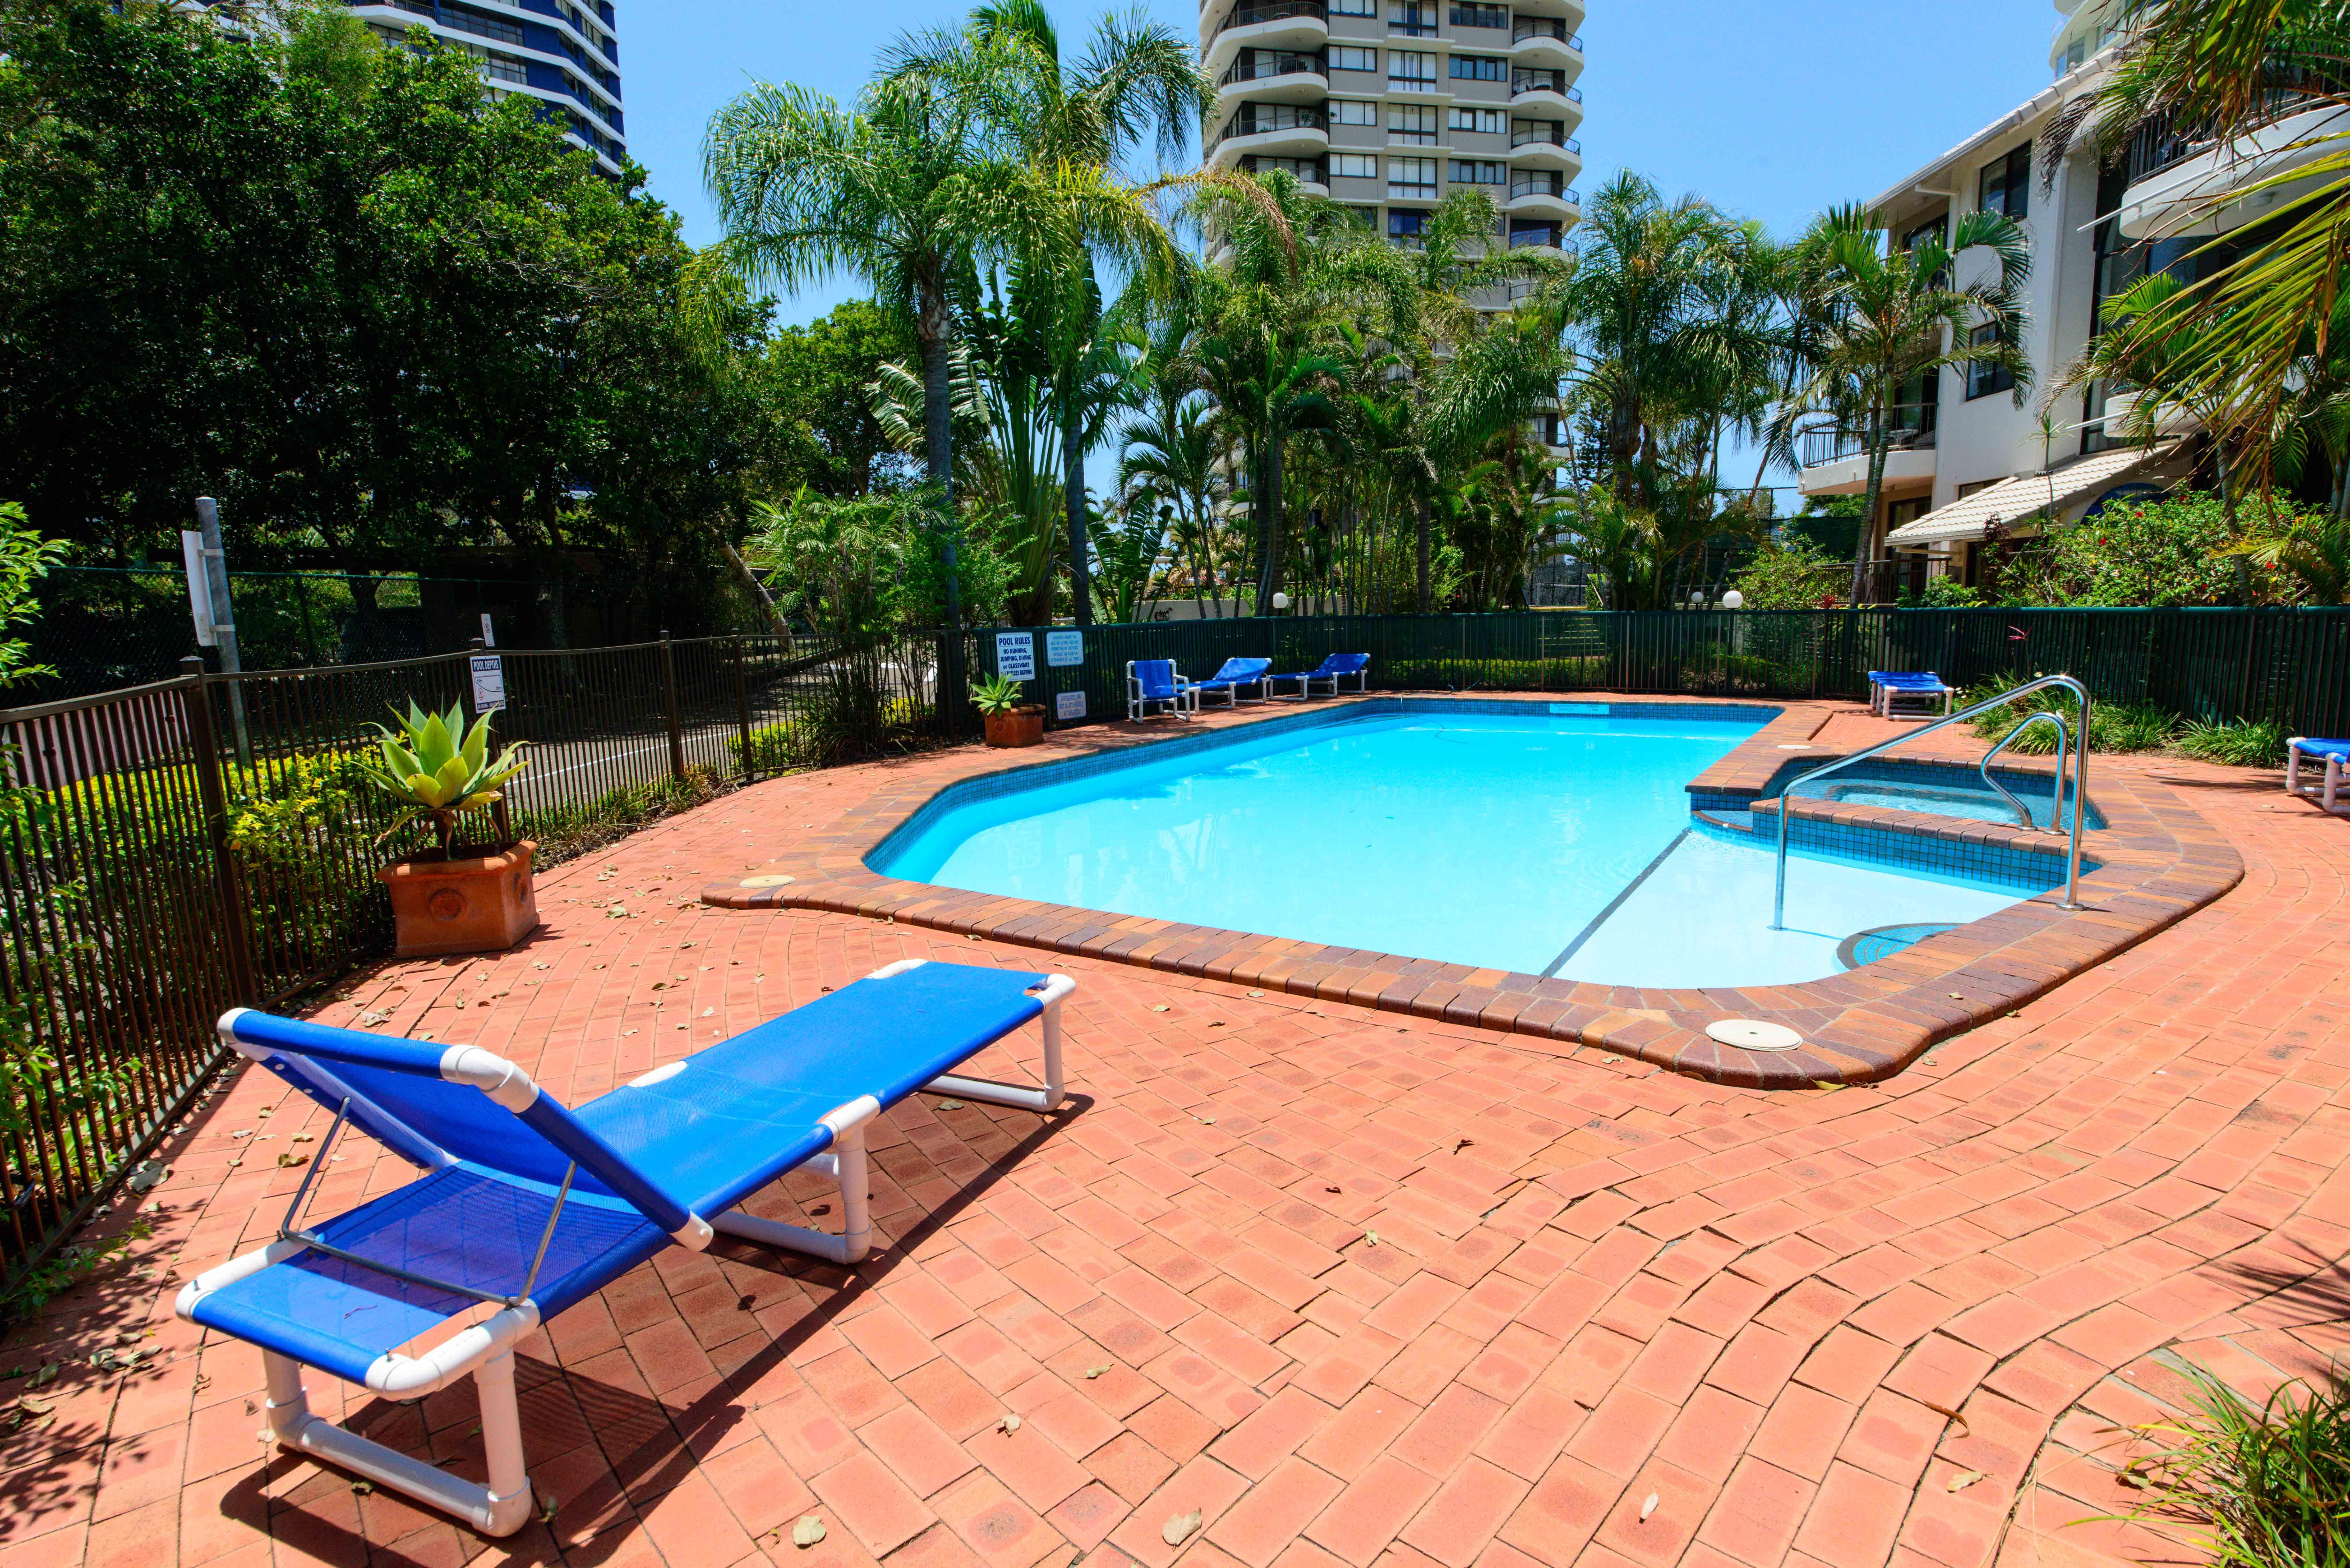 broadwater shores villa pool